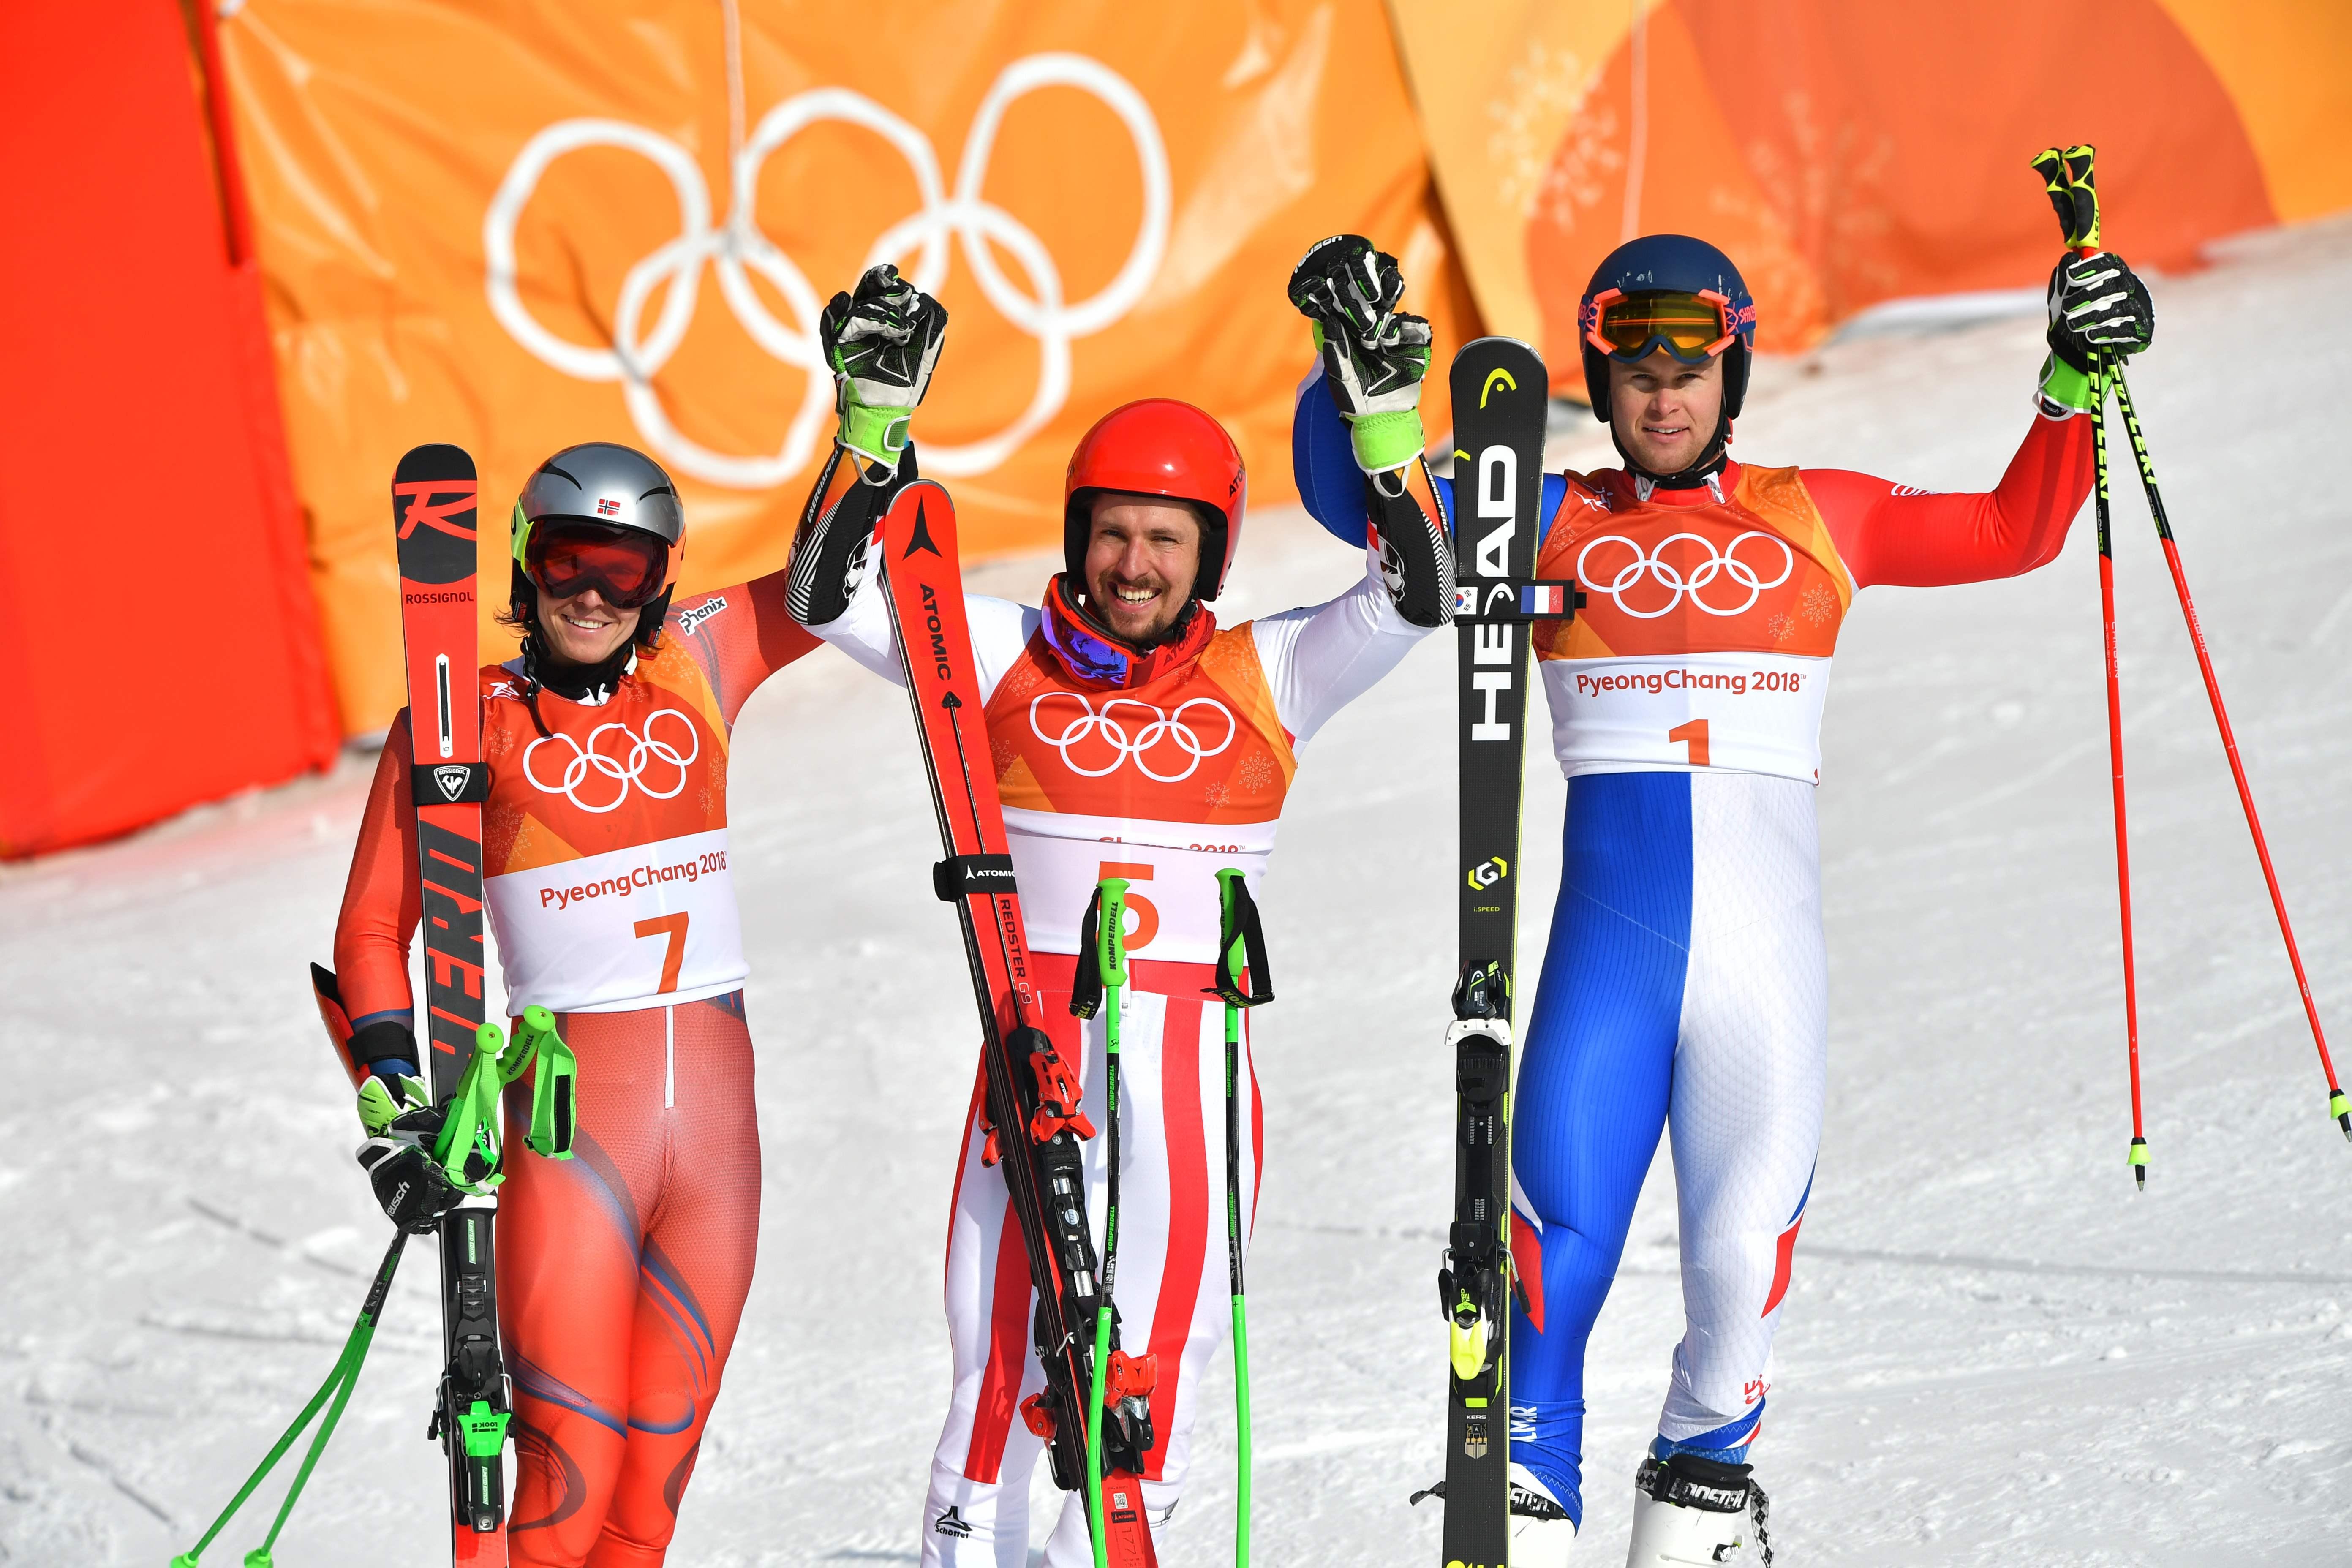 Jeux olympiques - Pyeongchang 2018 - JO 2018 : Hirscher imperial, Pinturault en bronze